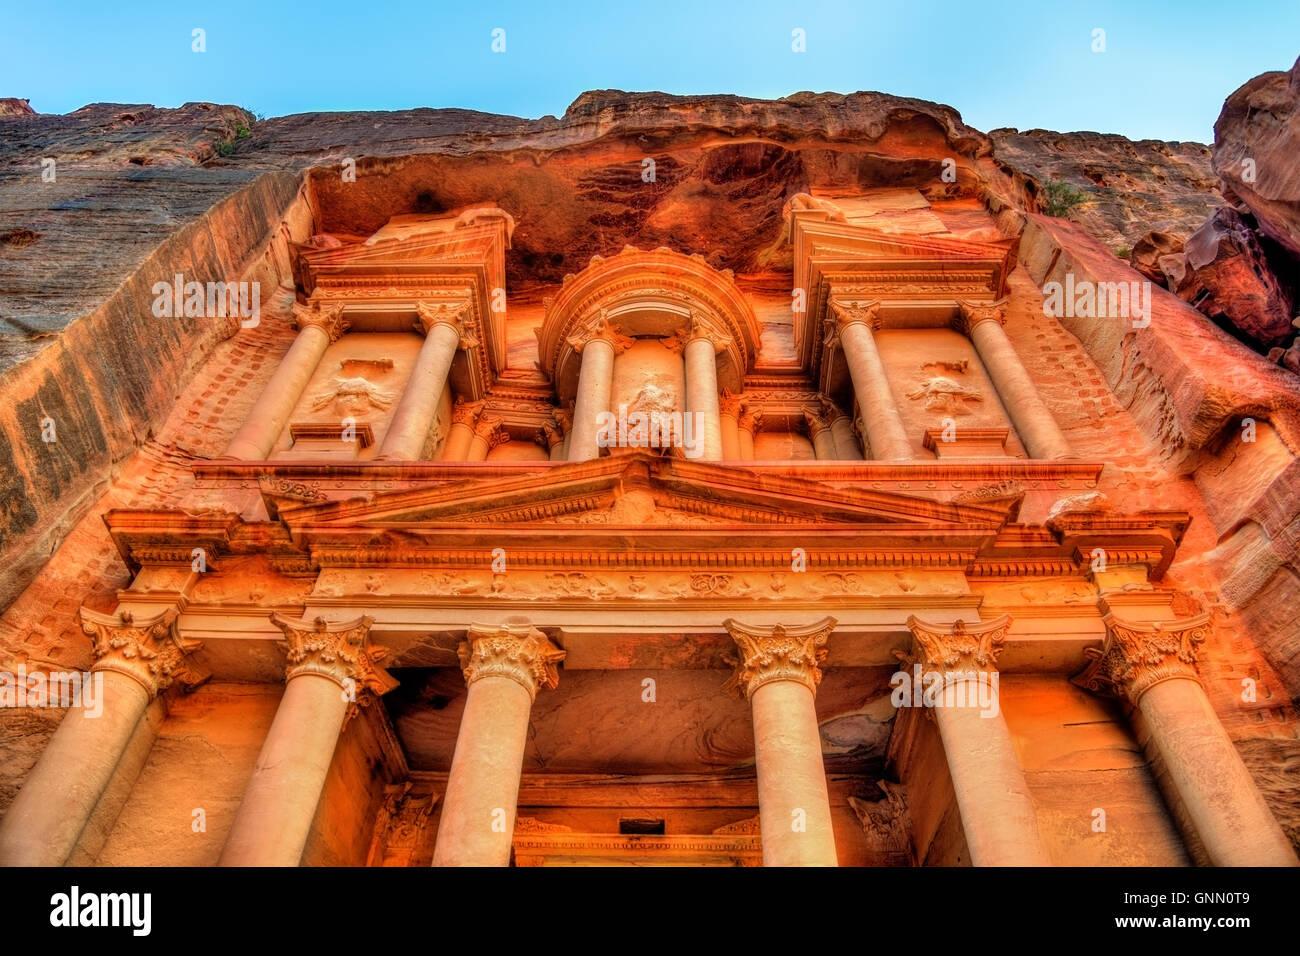 Al Khazneh temple in Petra. UNESCO world heritage site - Stock Image